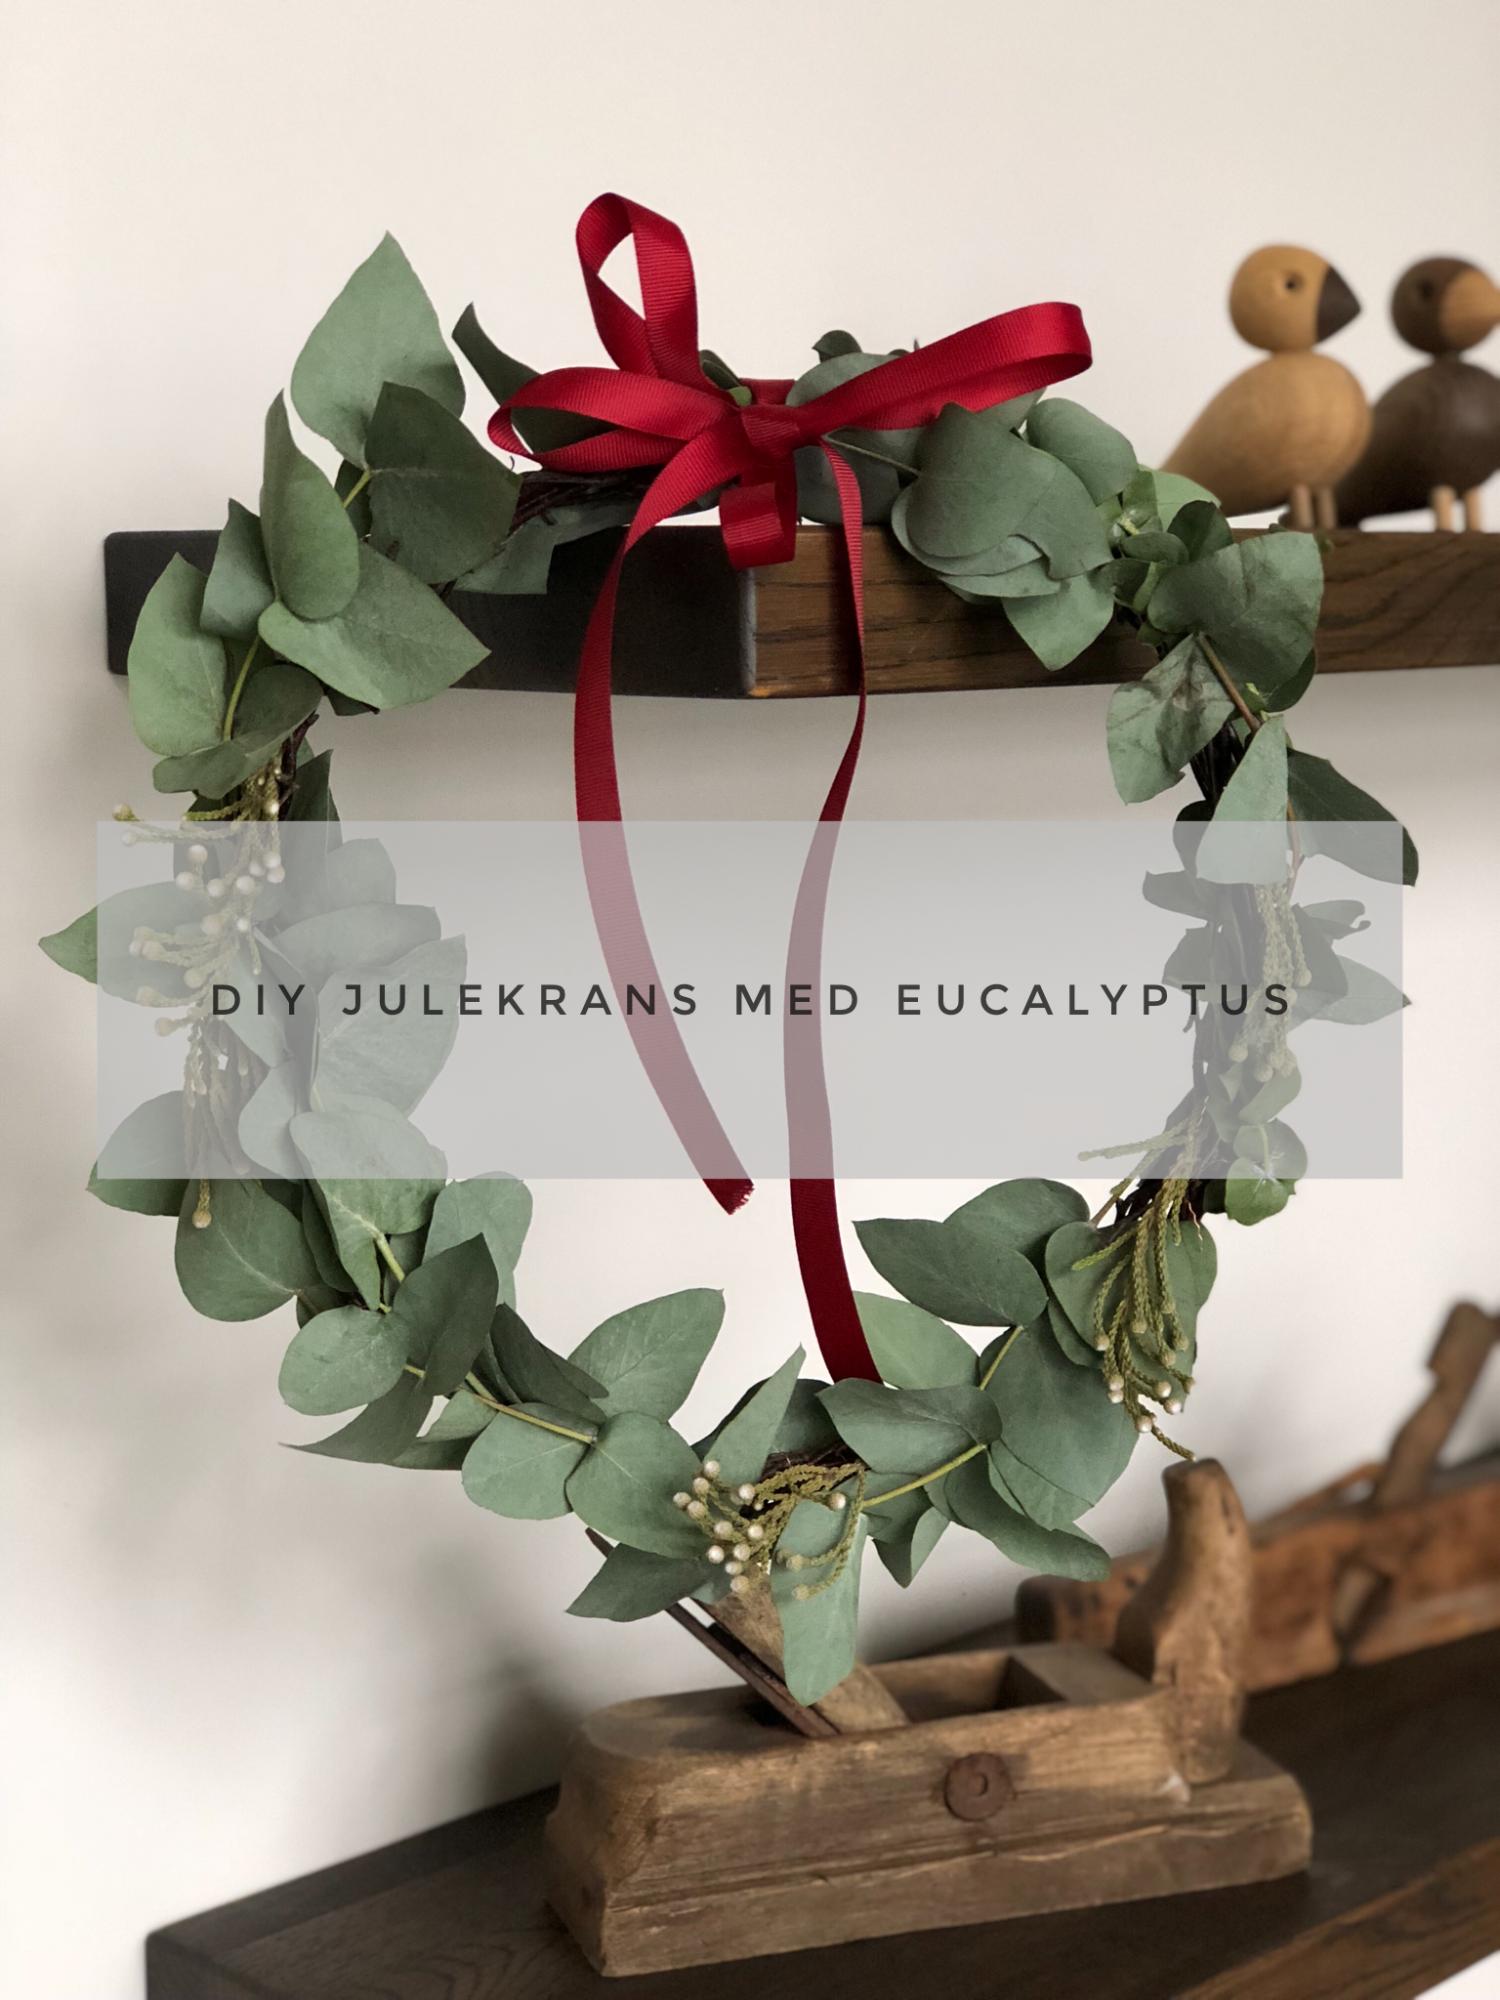 DIY: Julekrans af eucalyptus